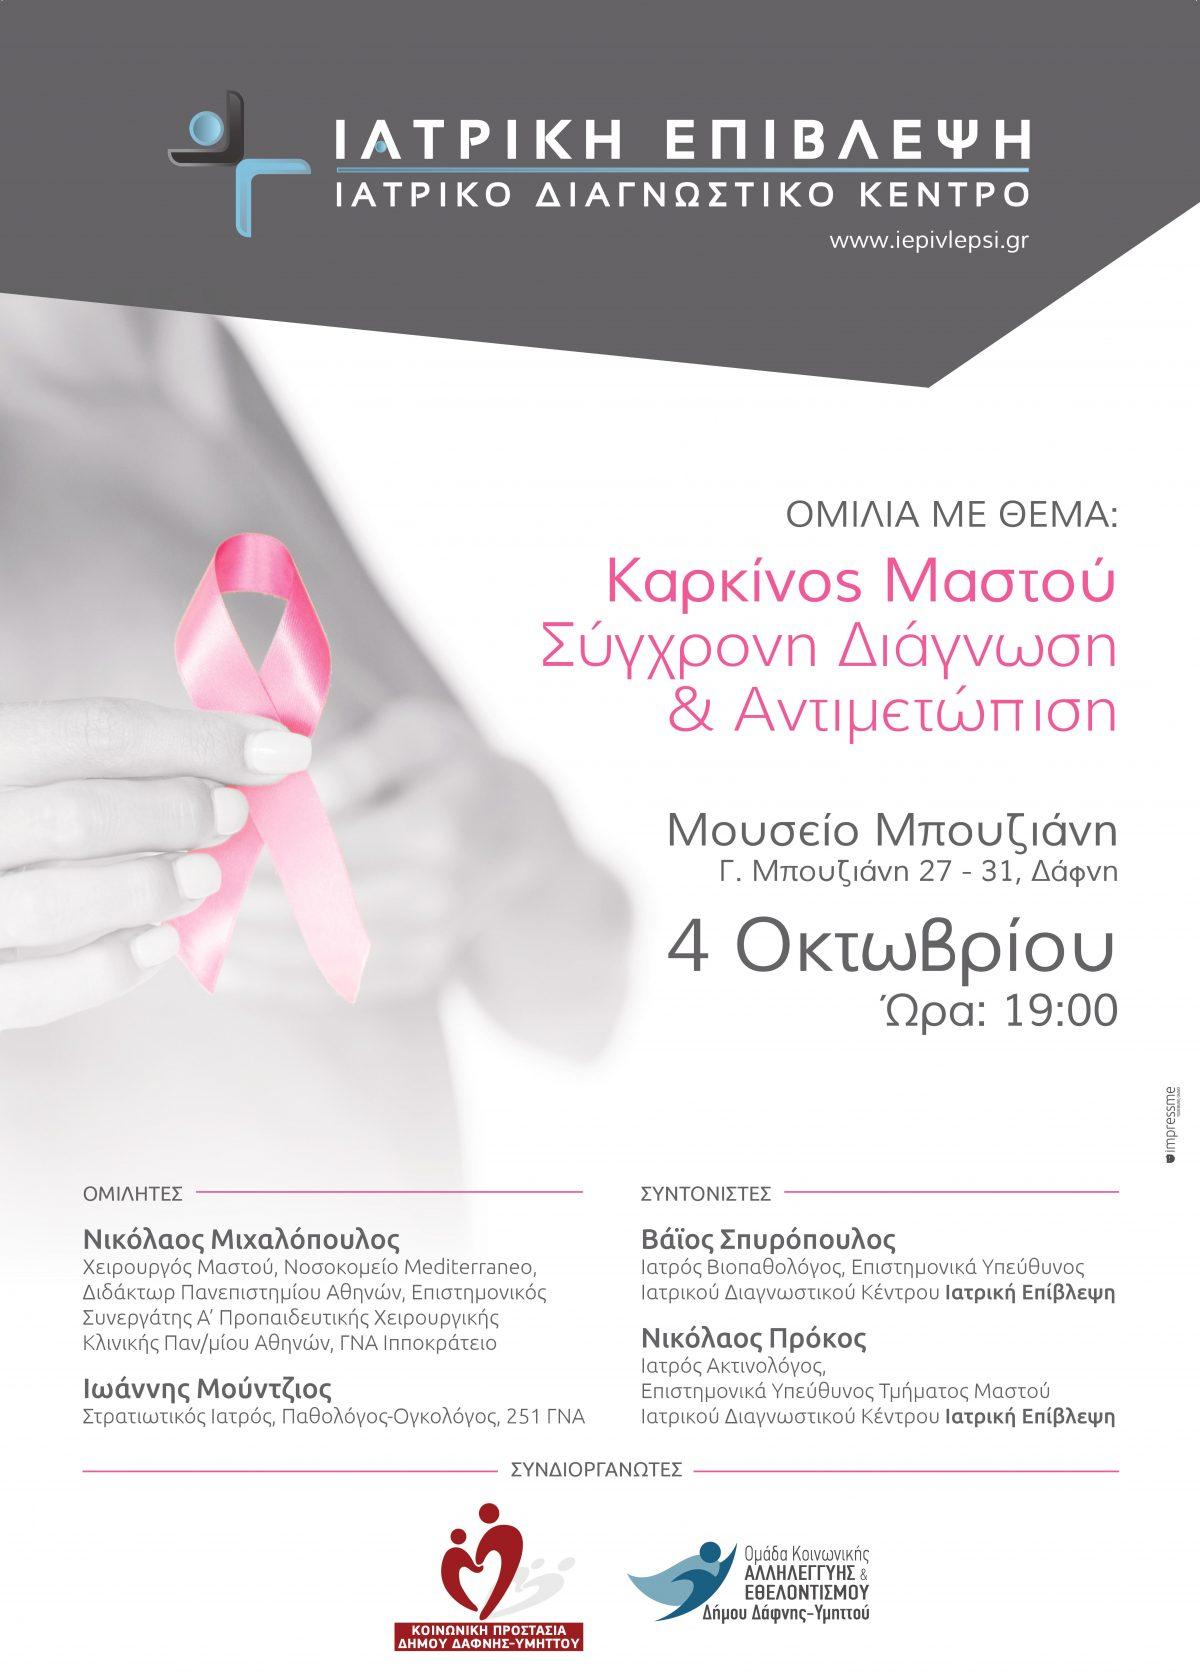 iatriki-epivlepsi-breast-cancer-poster-omilia-1200x1674.jpg